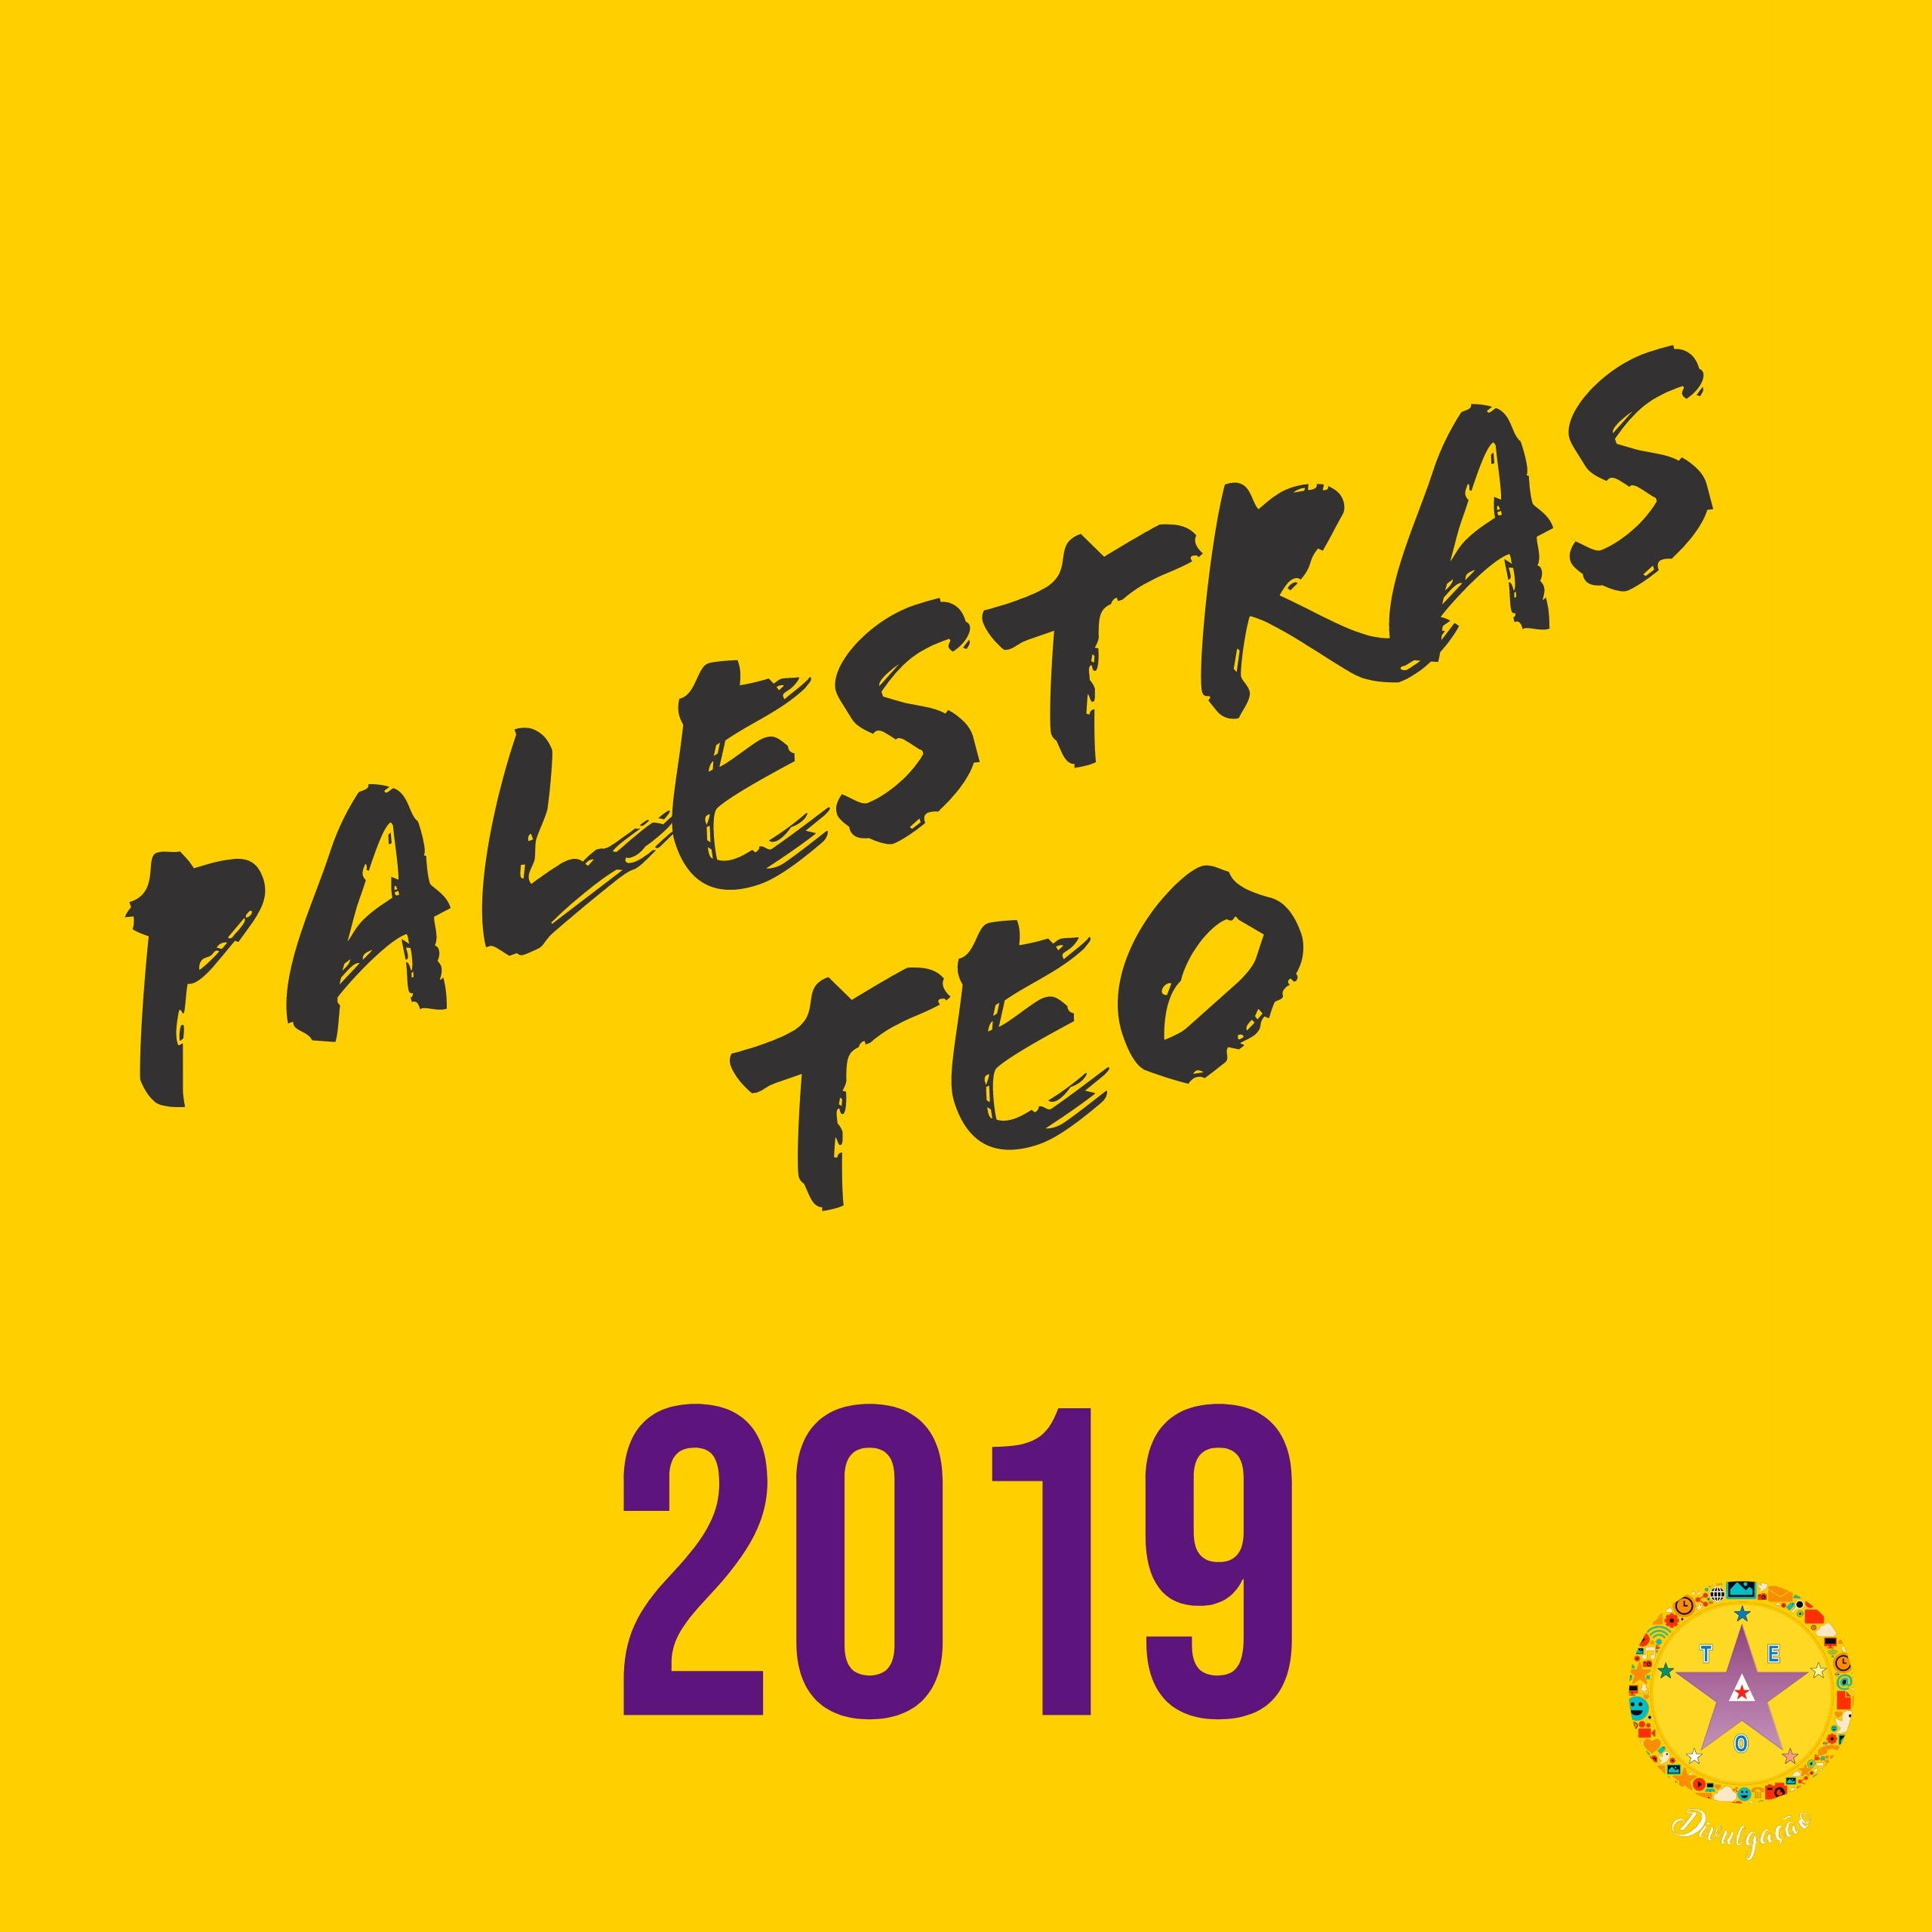 A Umbanda de Zélio de Moraes - Leonardo Cunha (bisneto de Zélio) #TEOPalestras2019